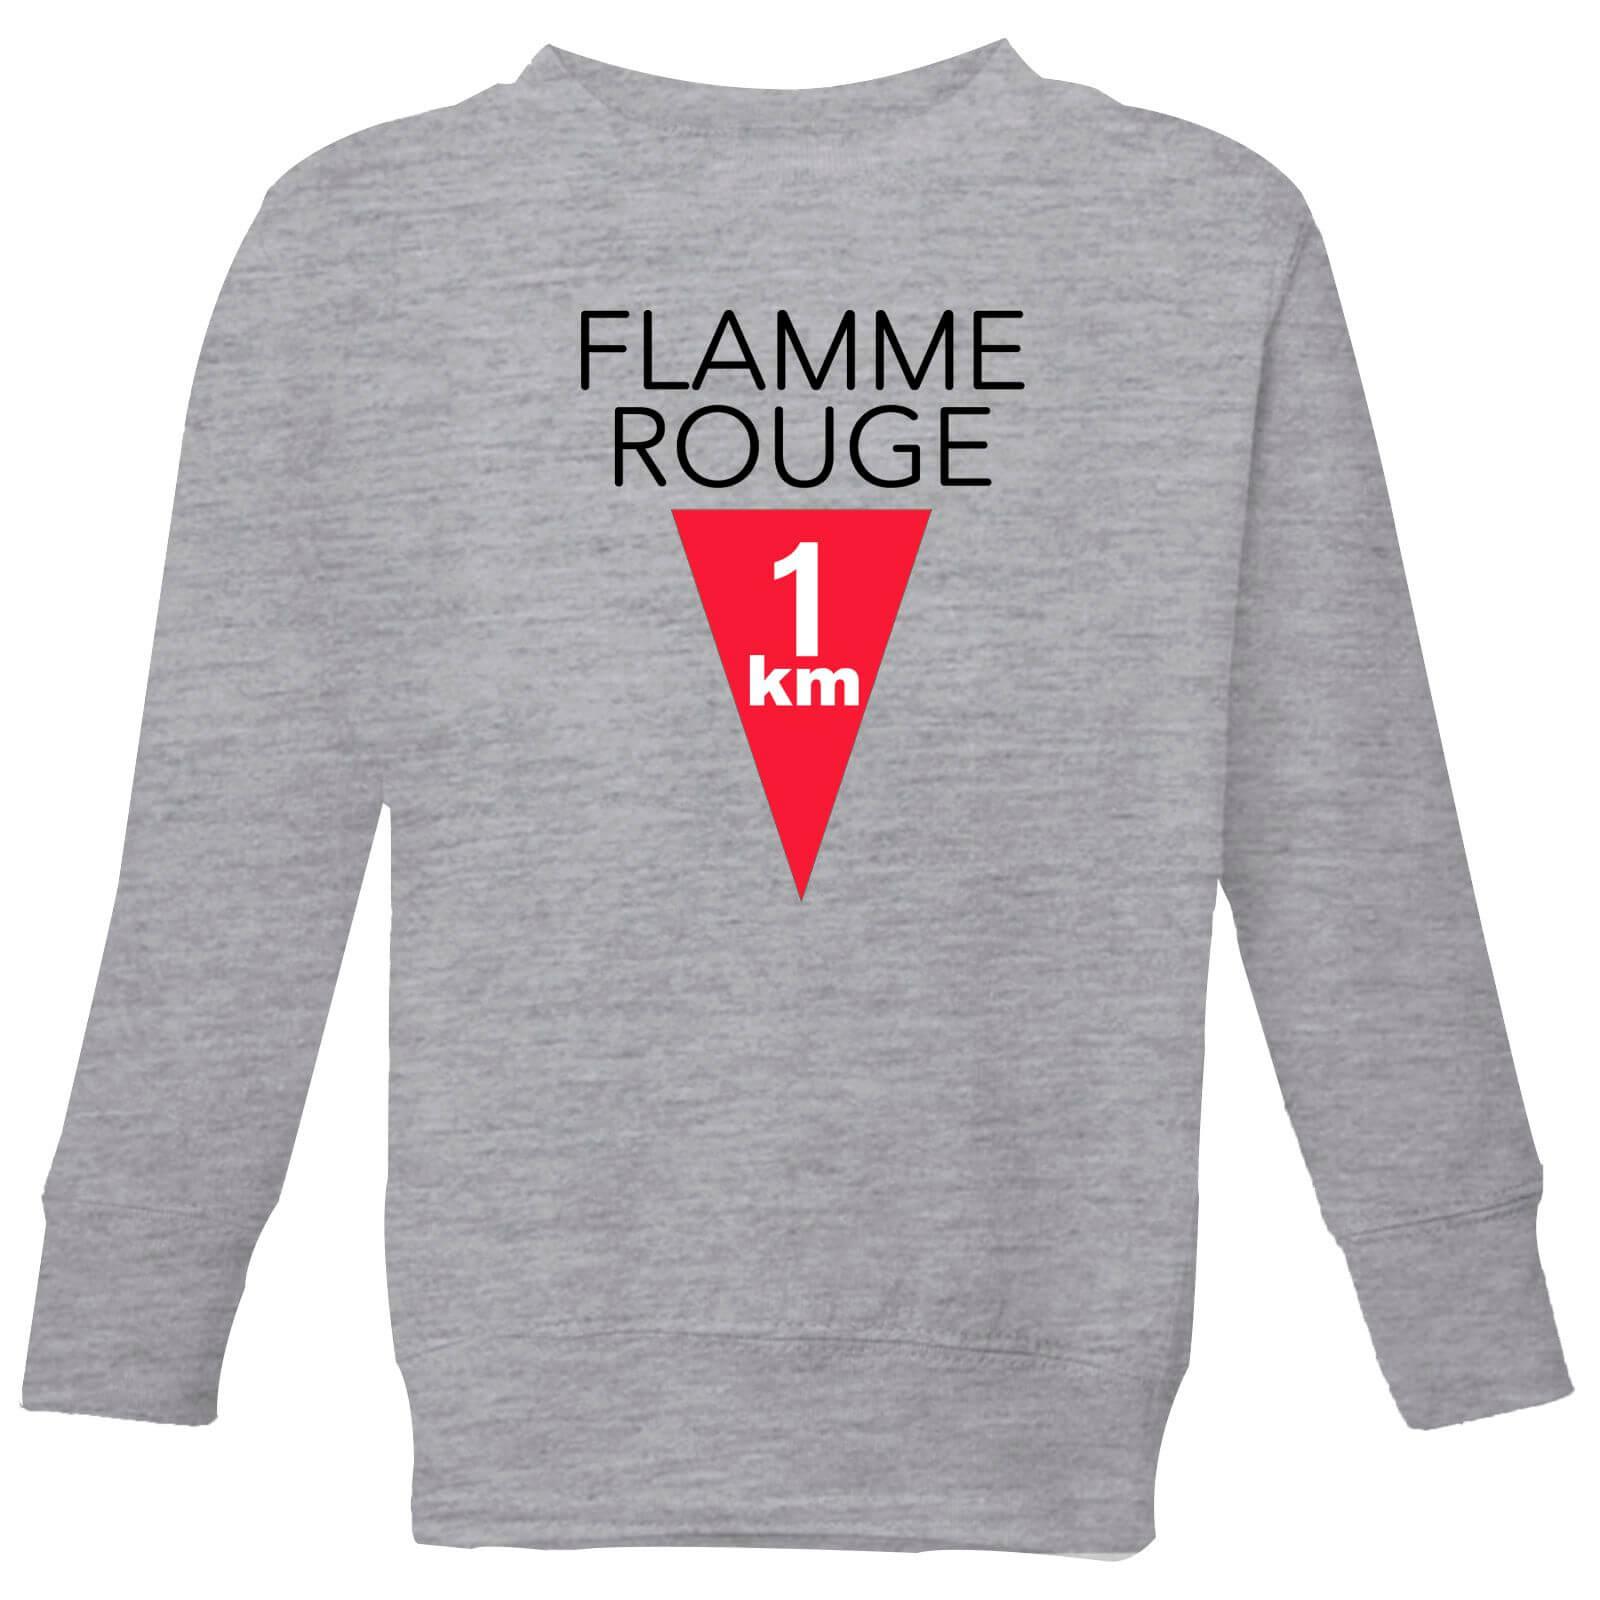 Summit Finish Flamme Rouge Kids' Sweatshirt - Grey - 9-10 Years - Grey